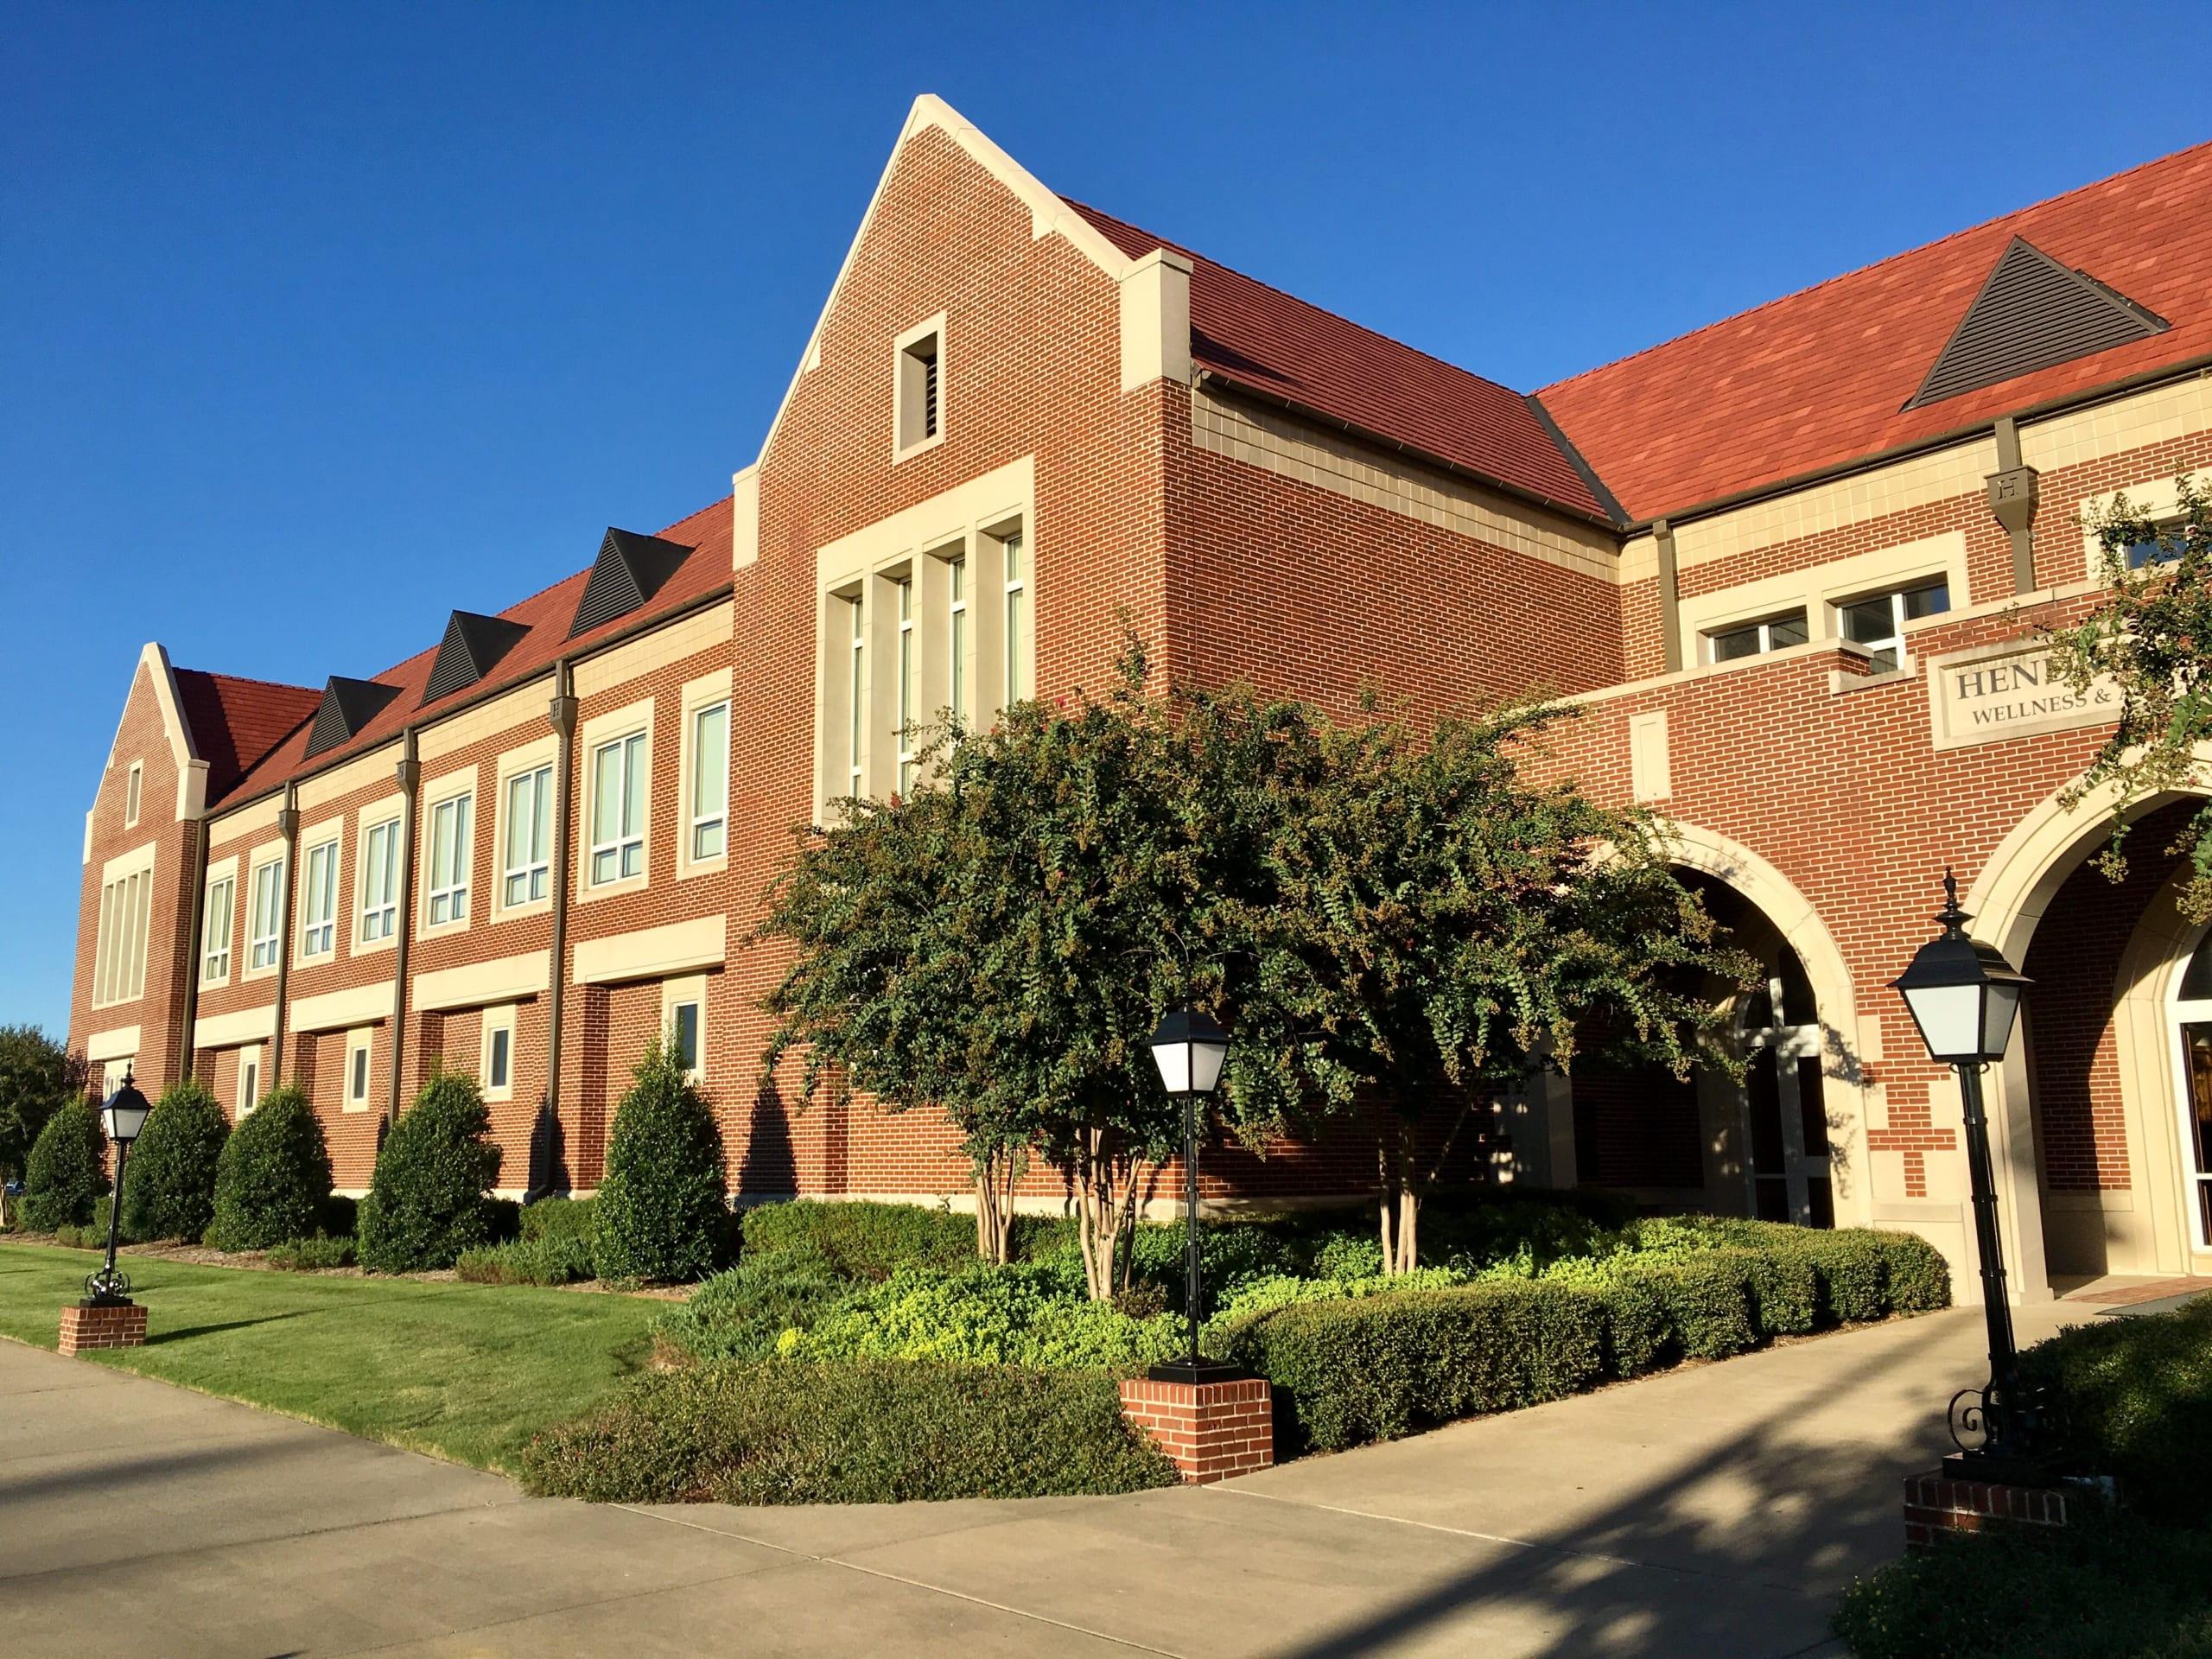 Hendrix College